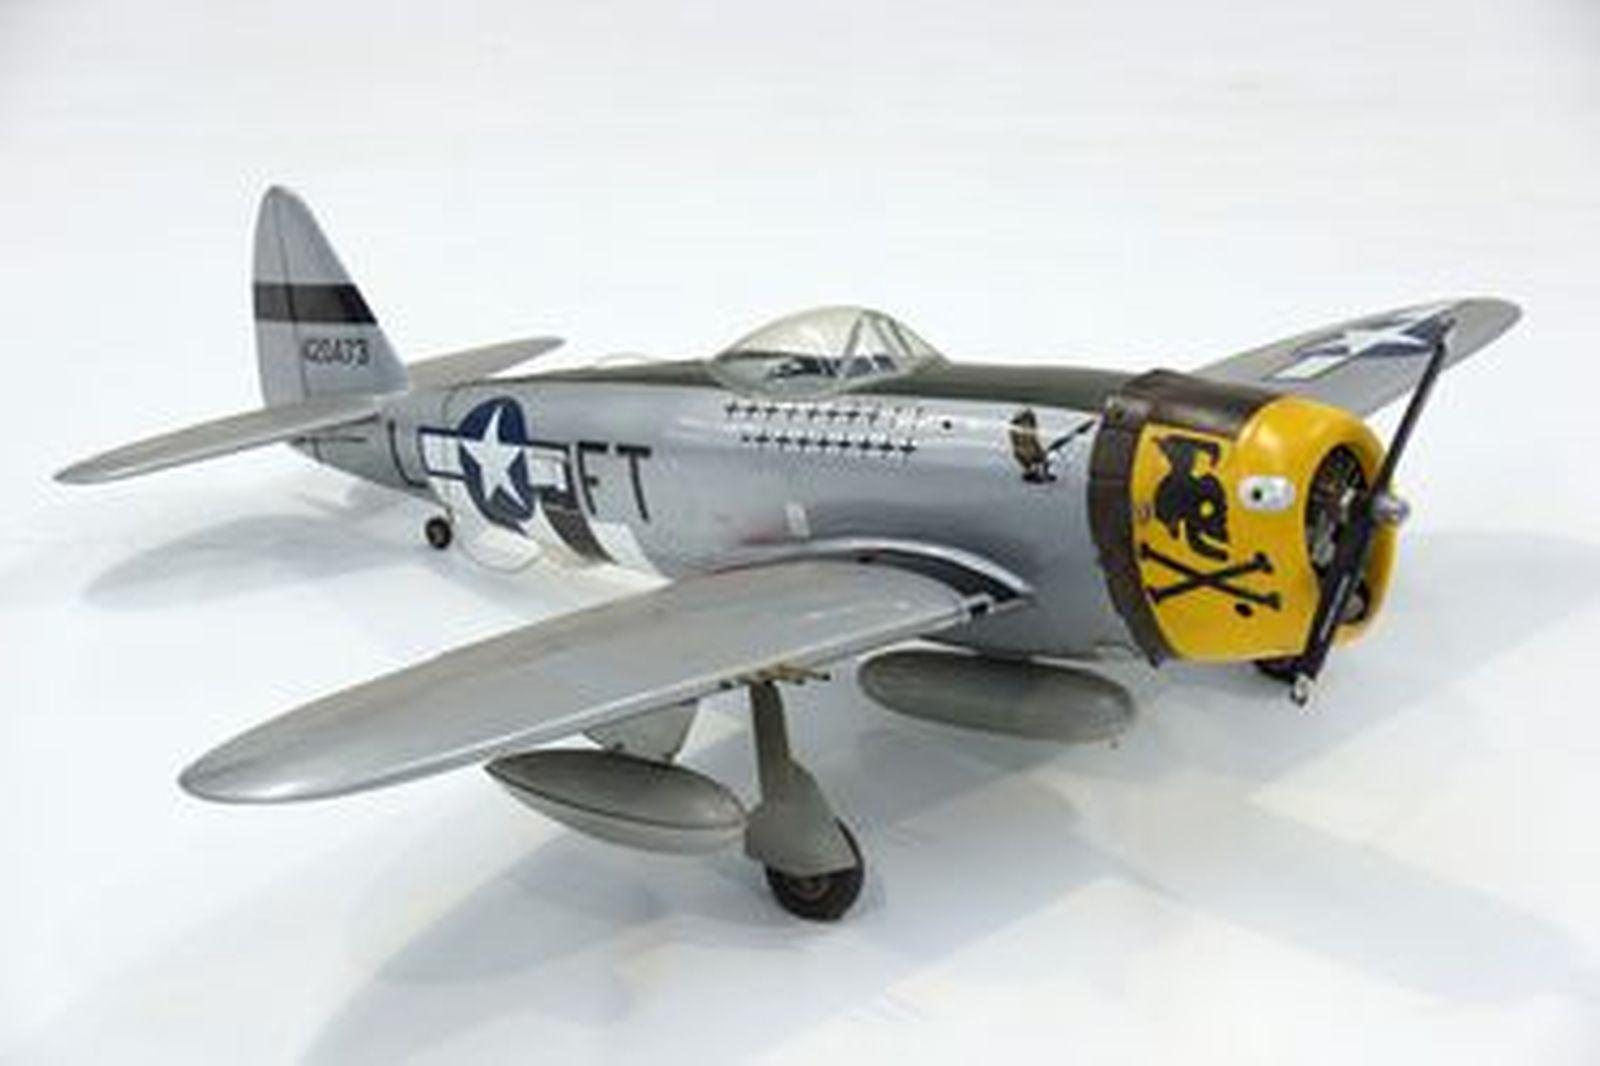 Thunderbolt Model Plane with motor & servos (160cm wingspan)